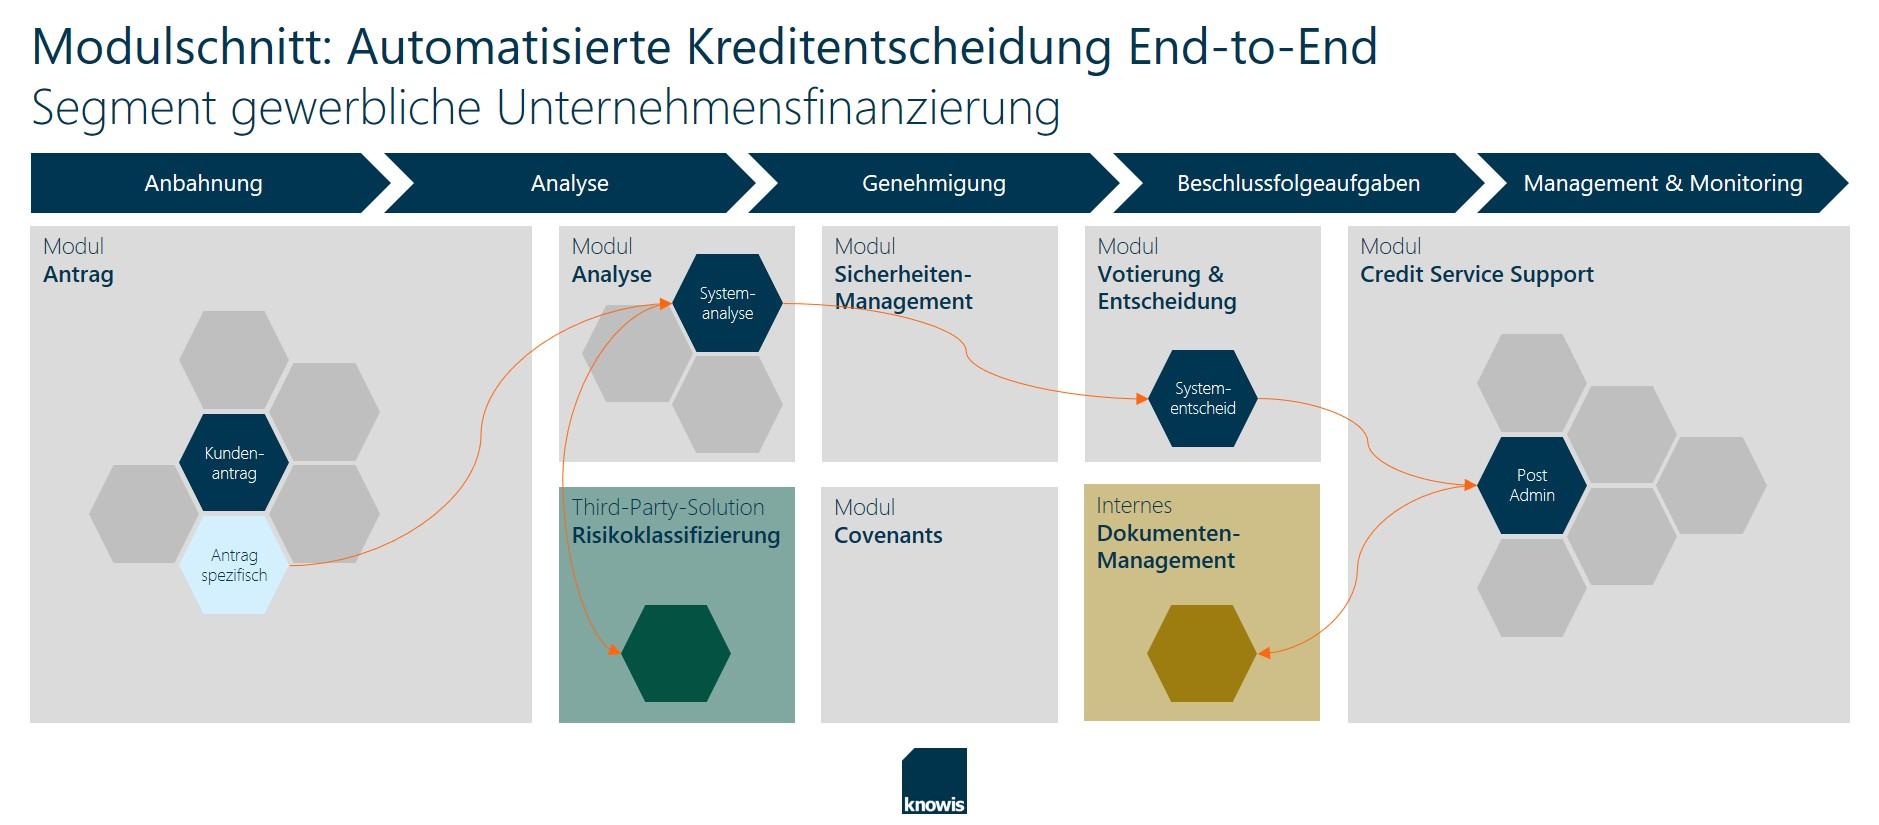 Modulschnitt Automatisierte Kreditentscheidung End-to-End